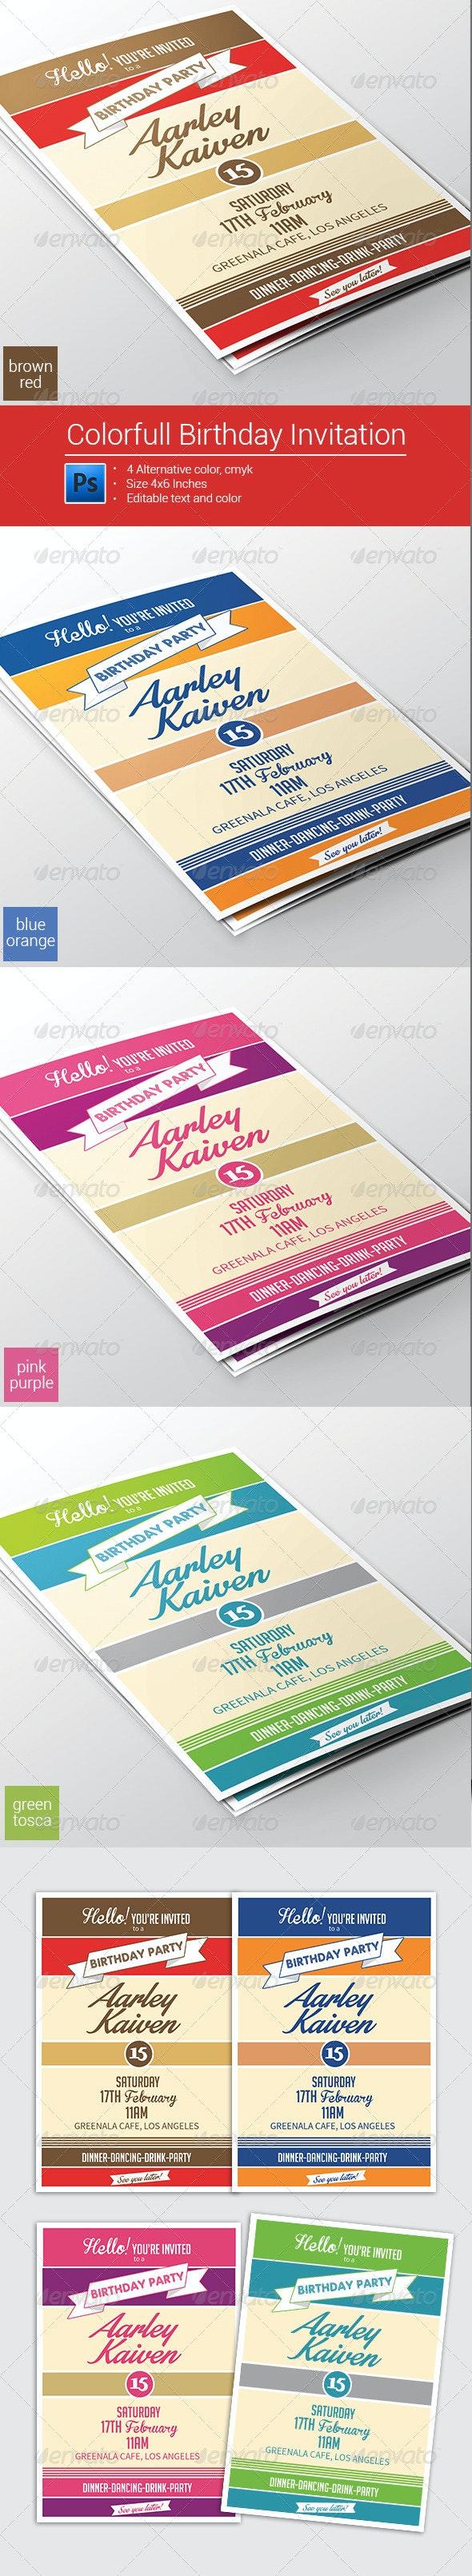 Colorfull Birthday Invitation - Invitations Cards & Invites